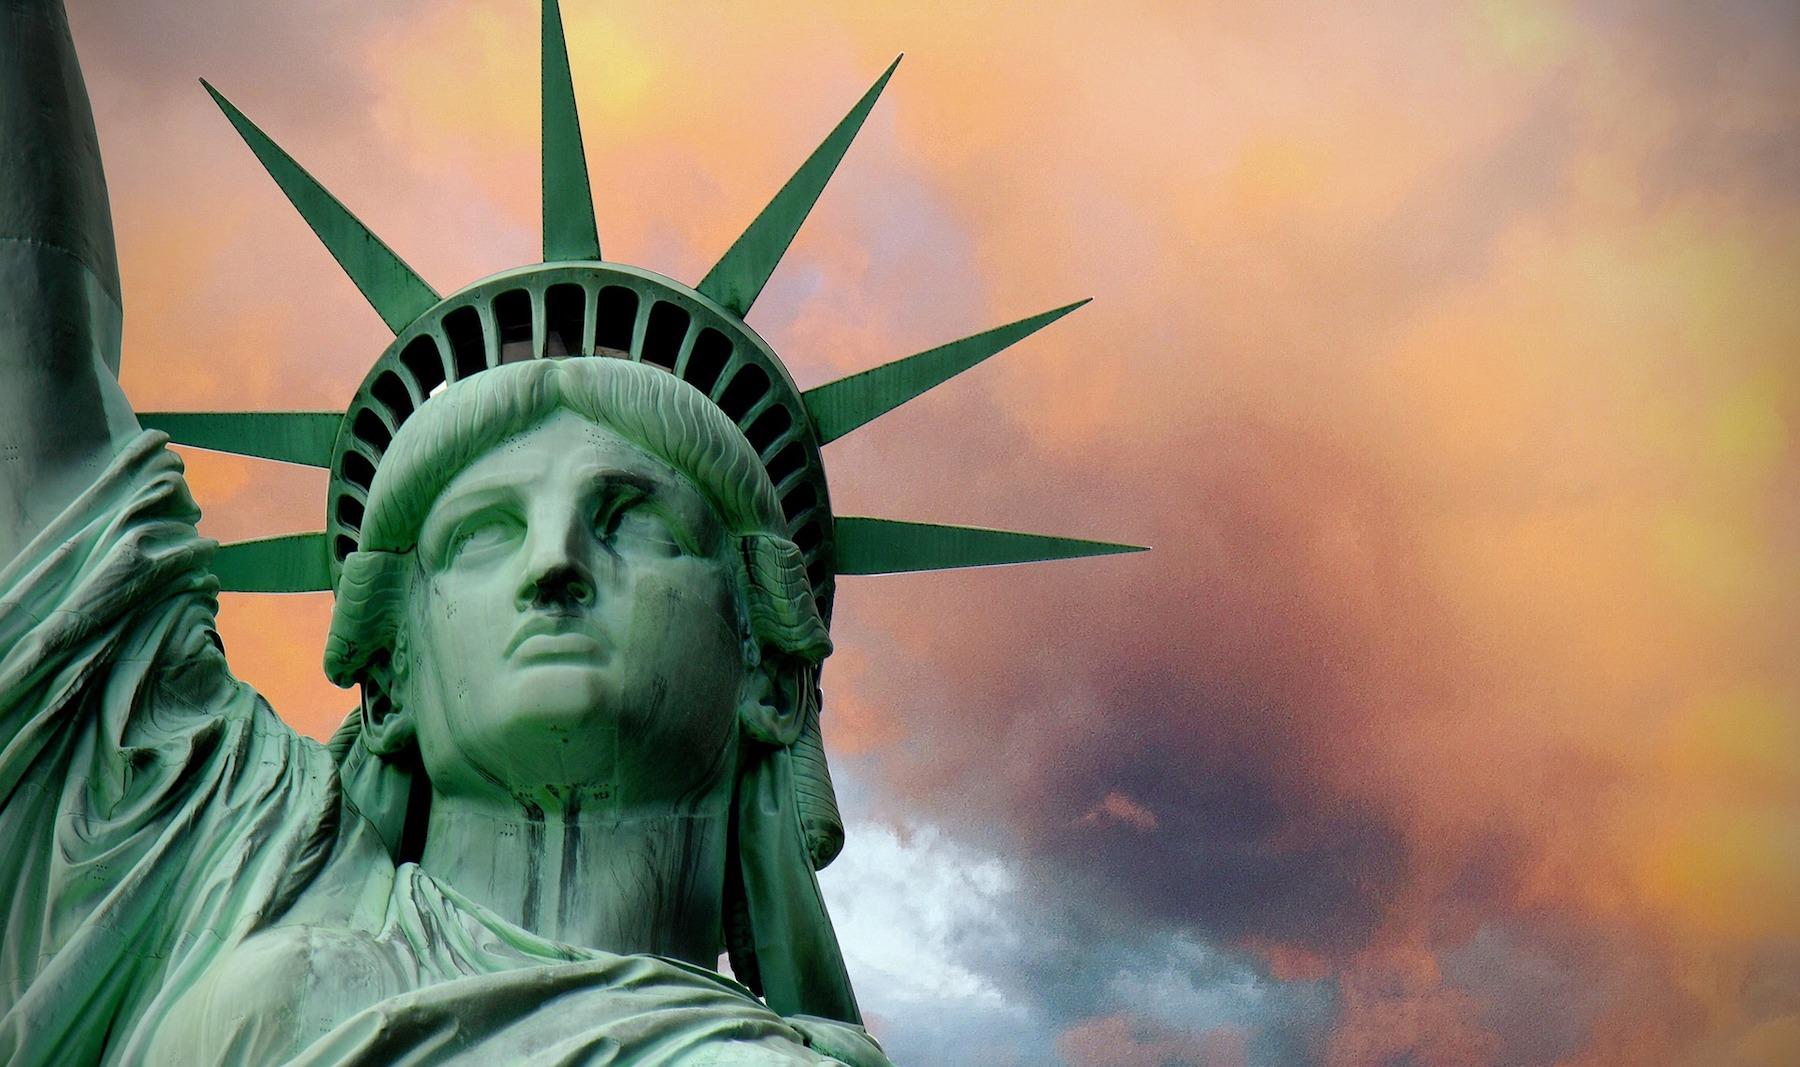 statue-of-liberty-2327760 1920